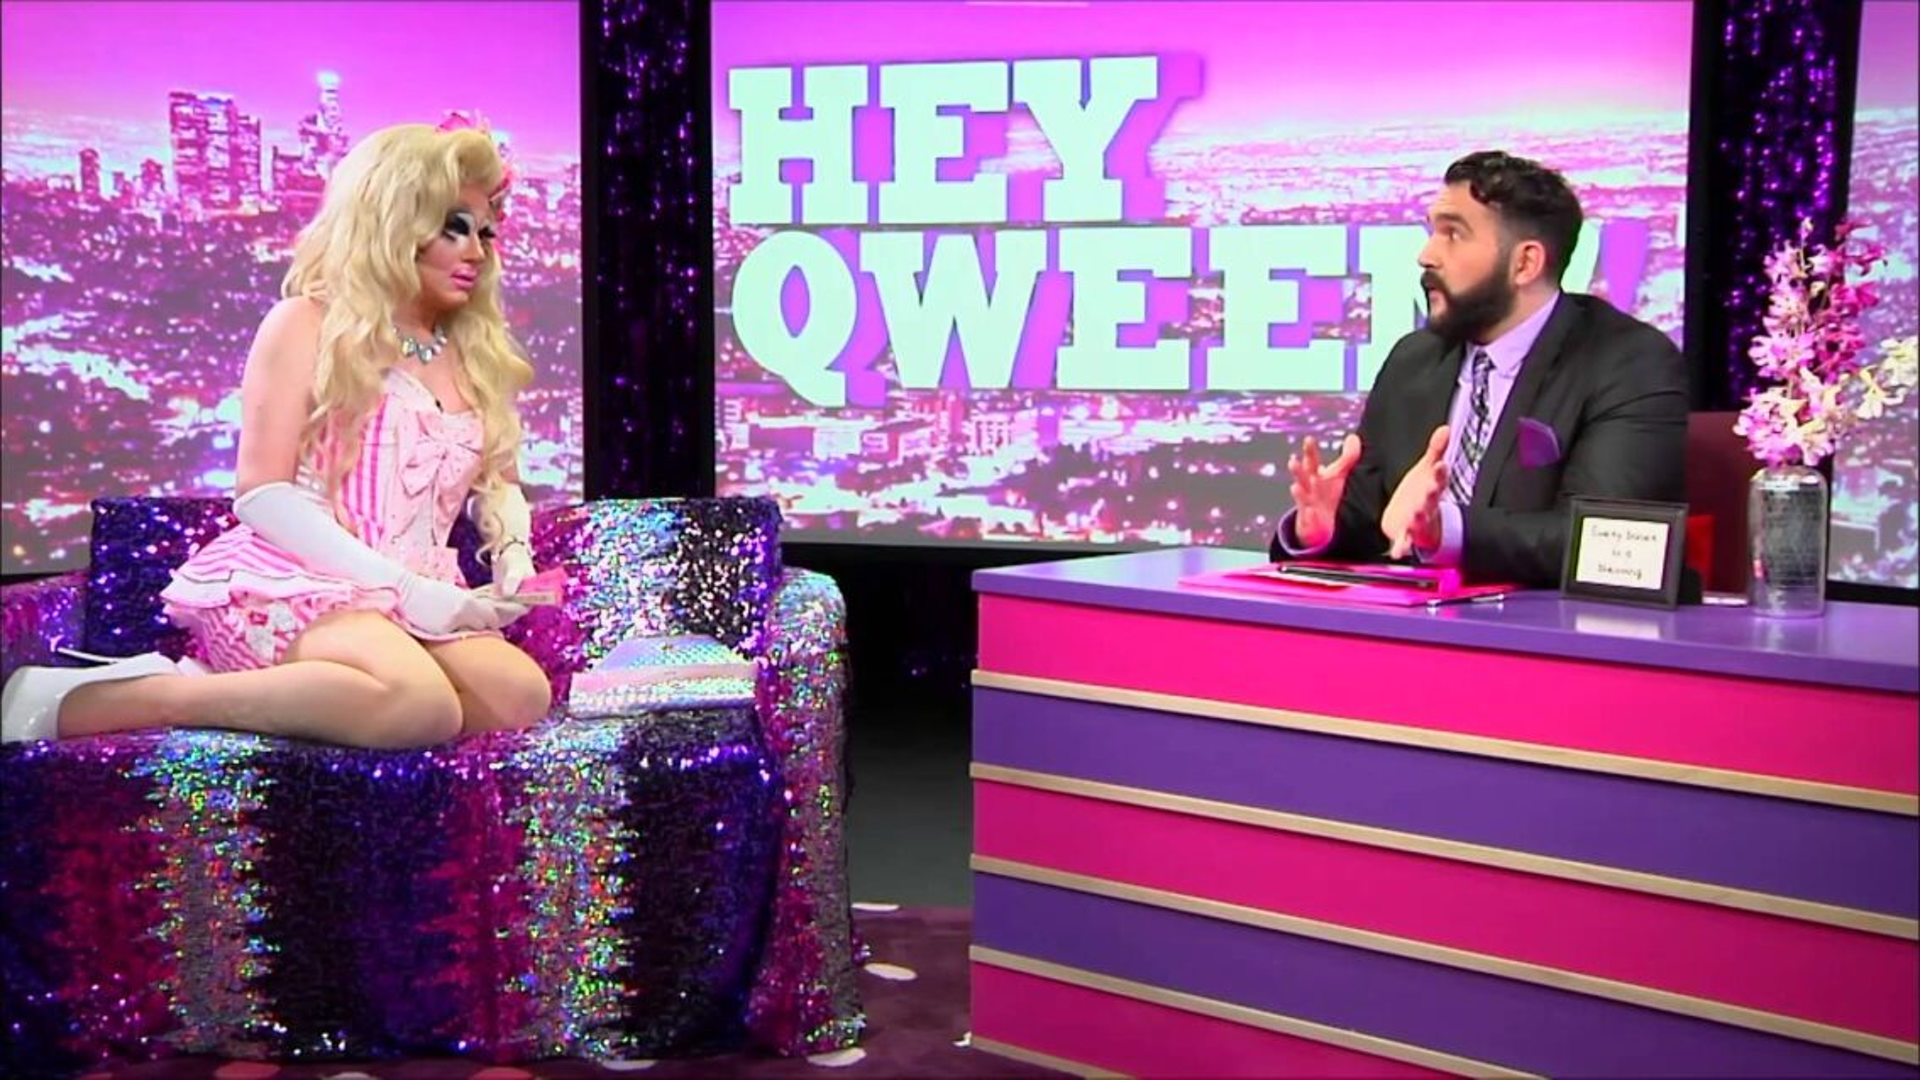 Mitch Vaughn's Famous Explosive Cum Shot: Hey Qween! Highlights